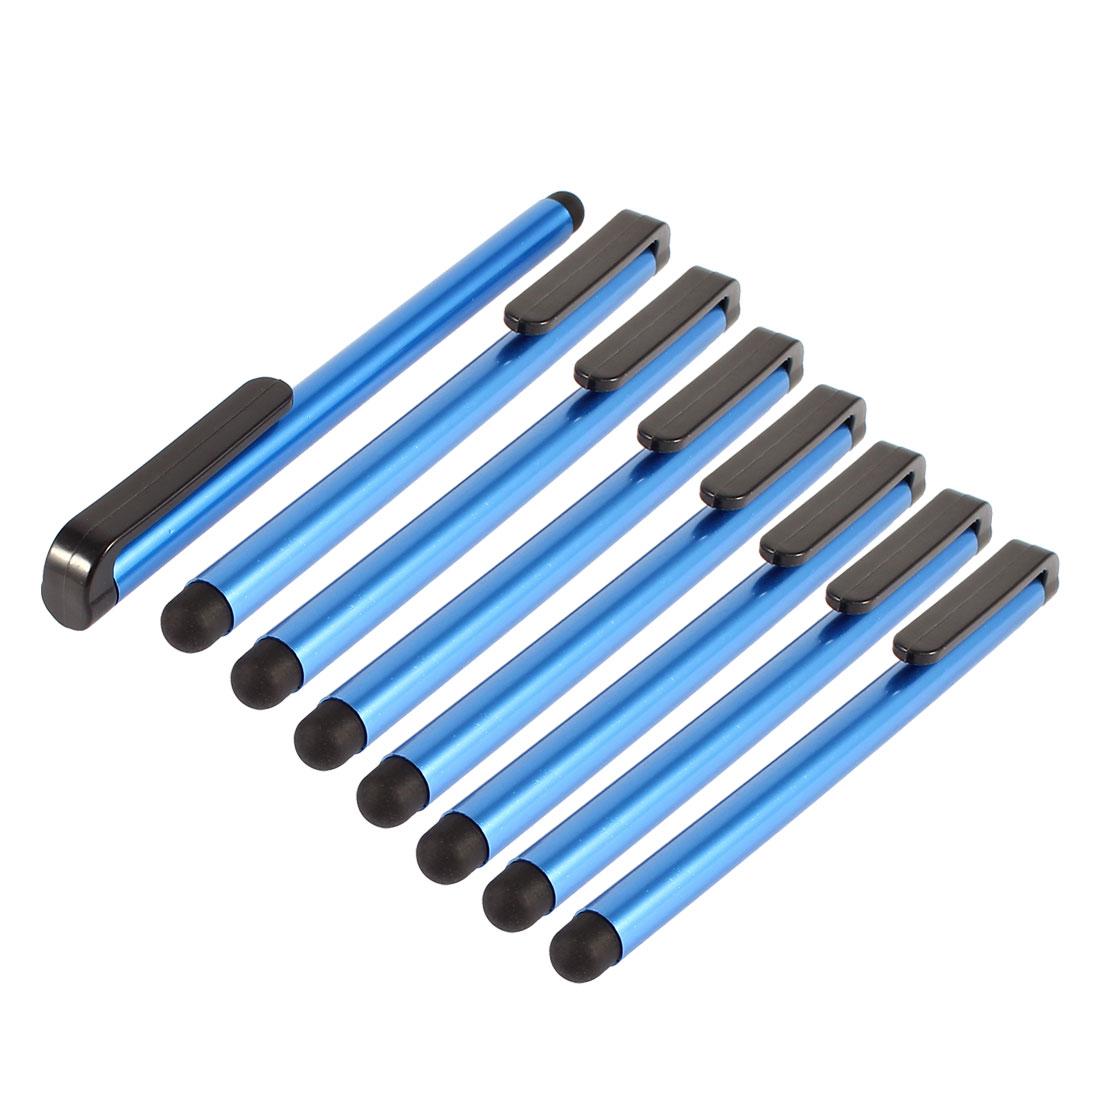 8 Pcs Soft Tip Dark Blue Screen Touch Stylus Pen for Mobile Phone